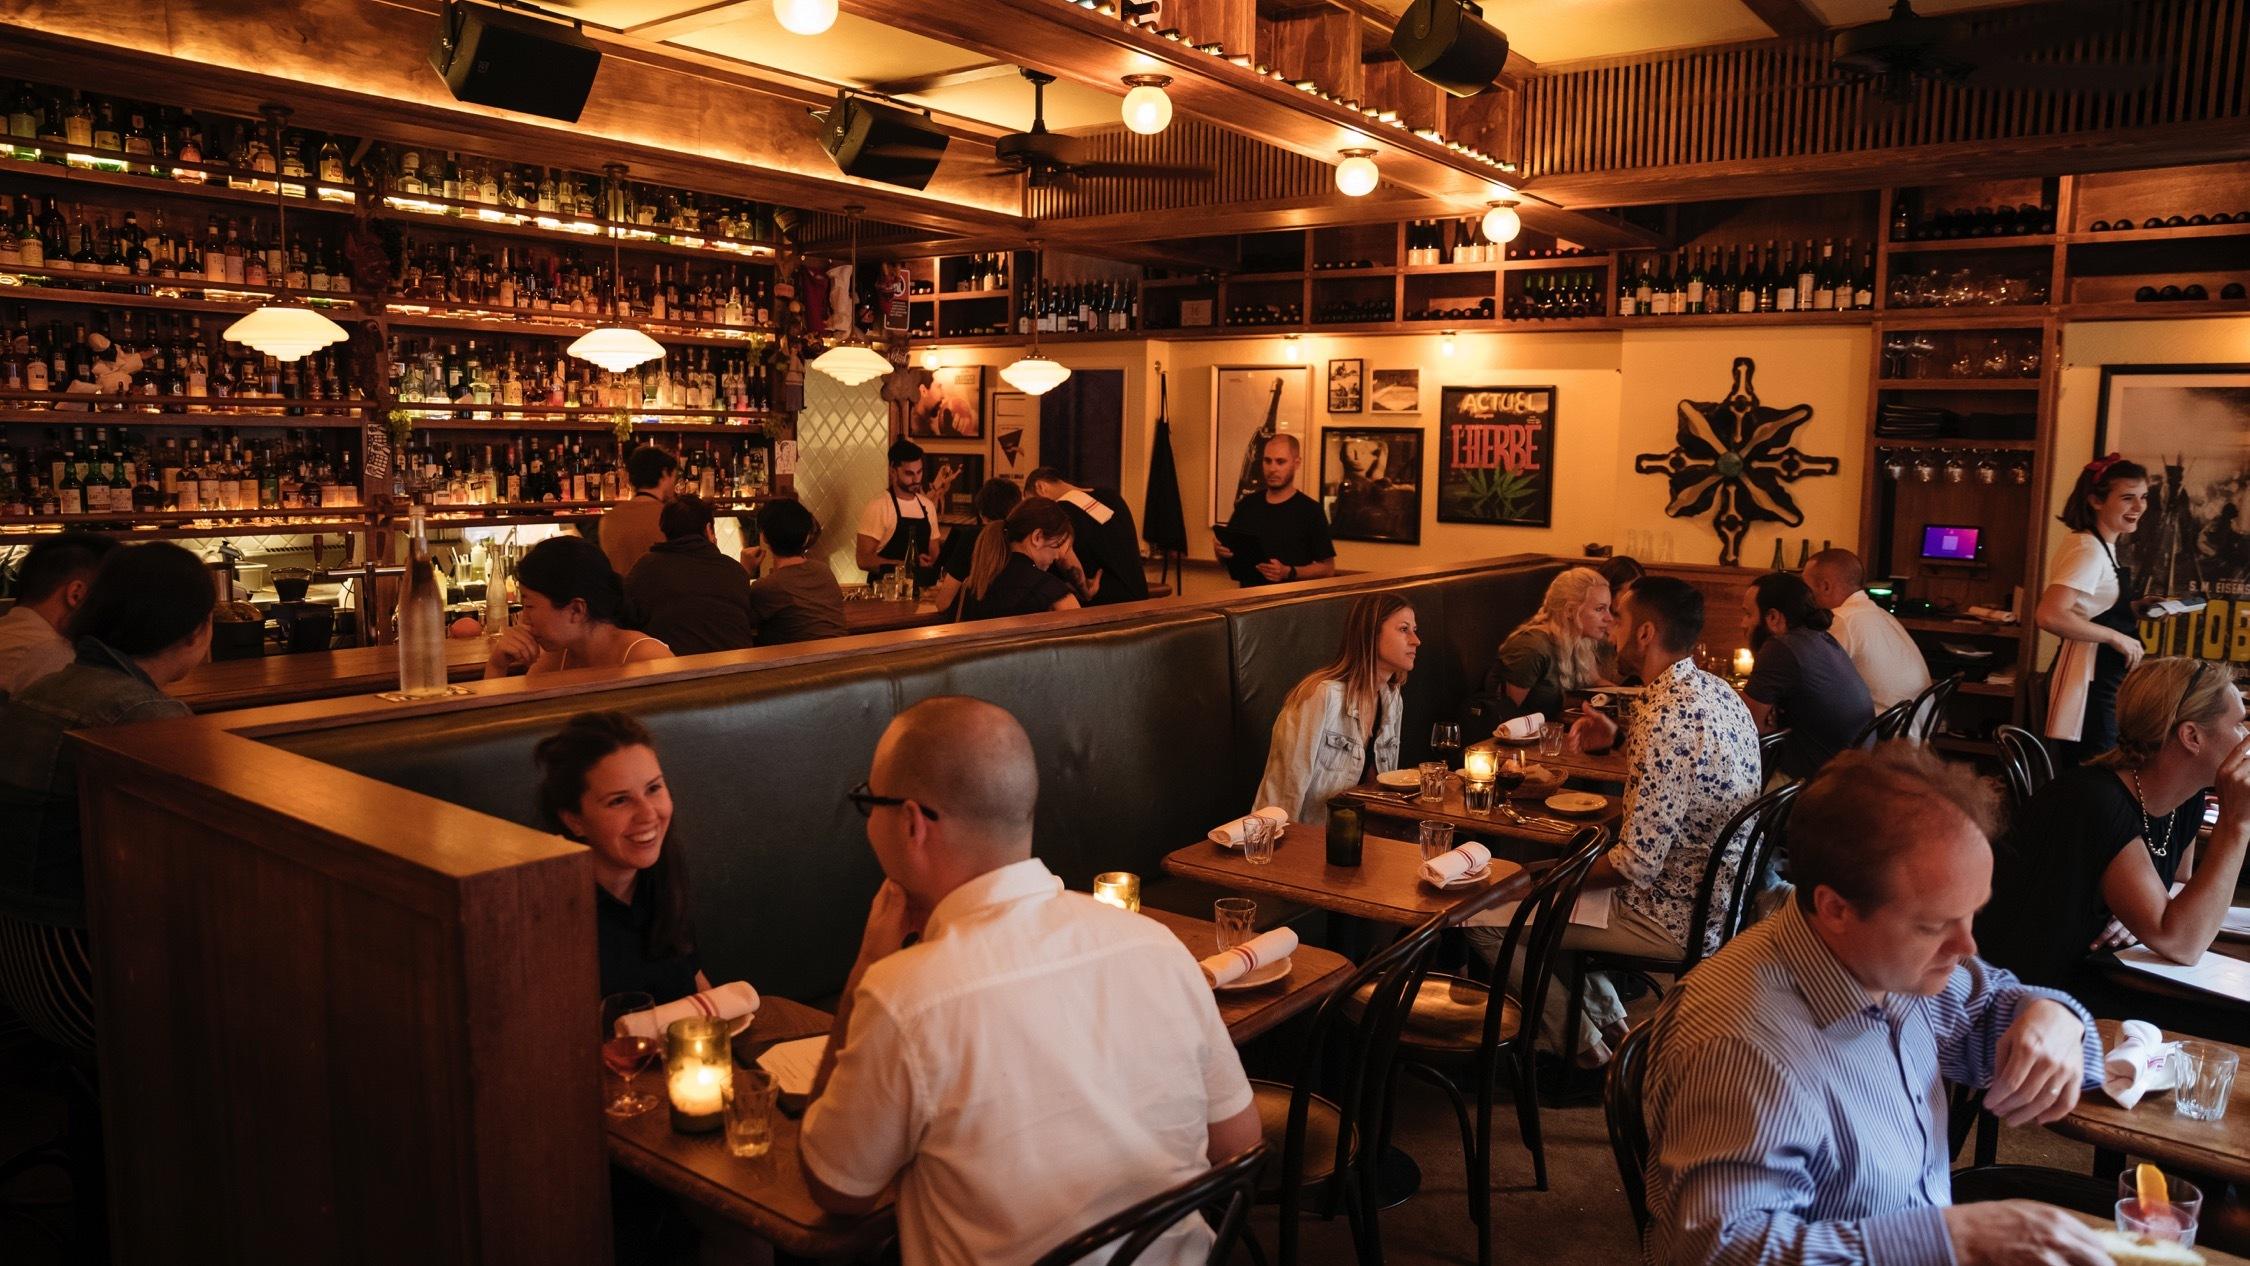 People sitting inside at Alberto's Lounge